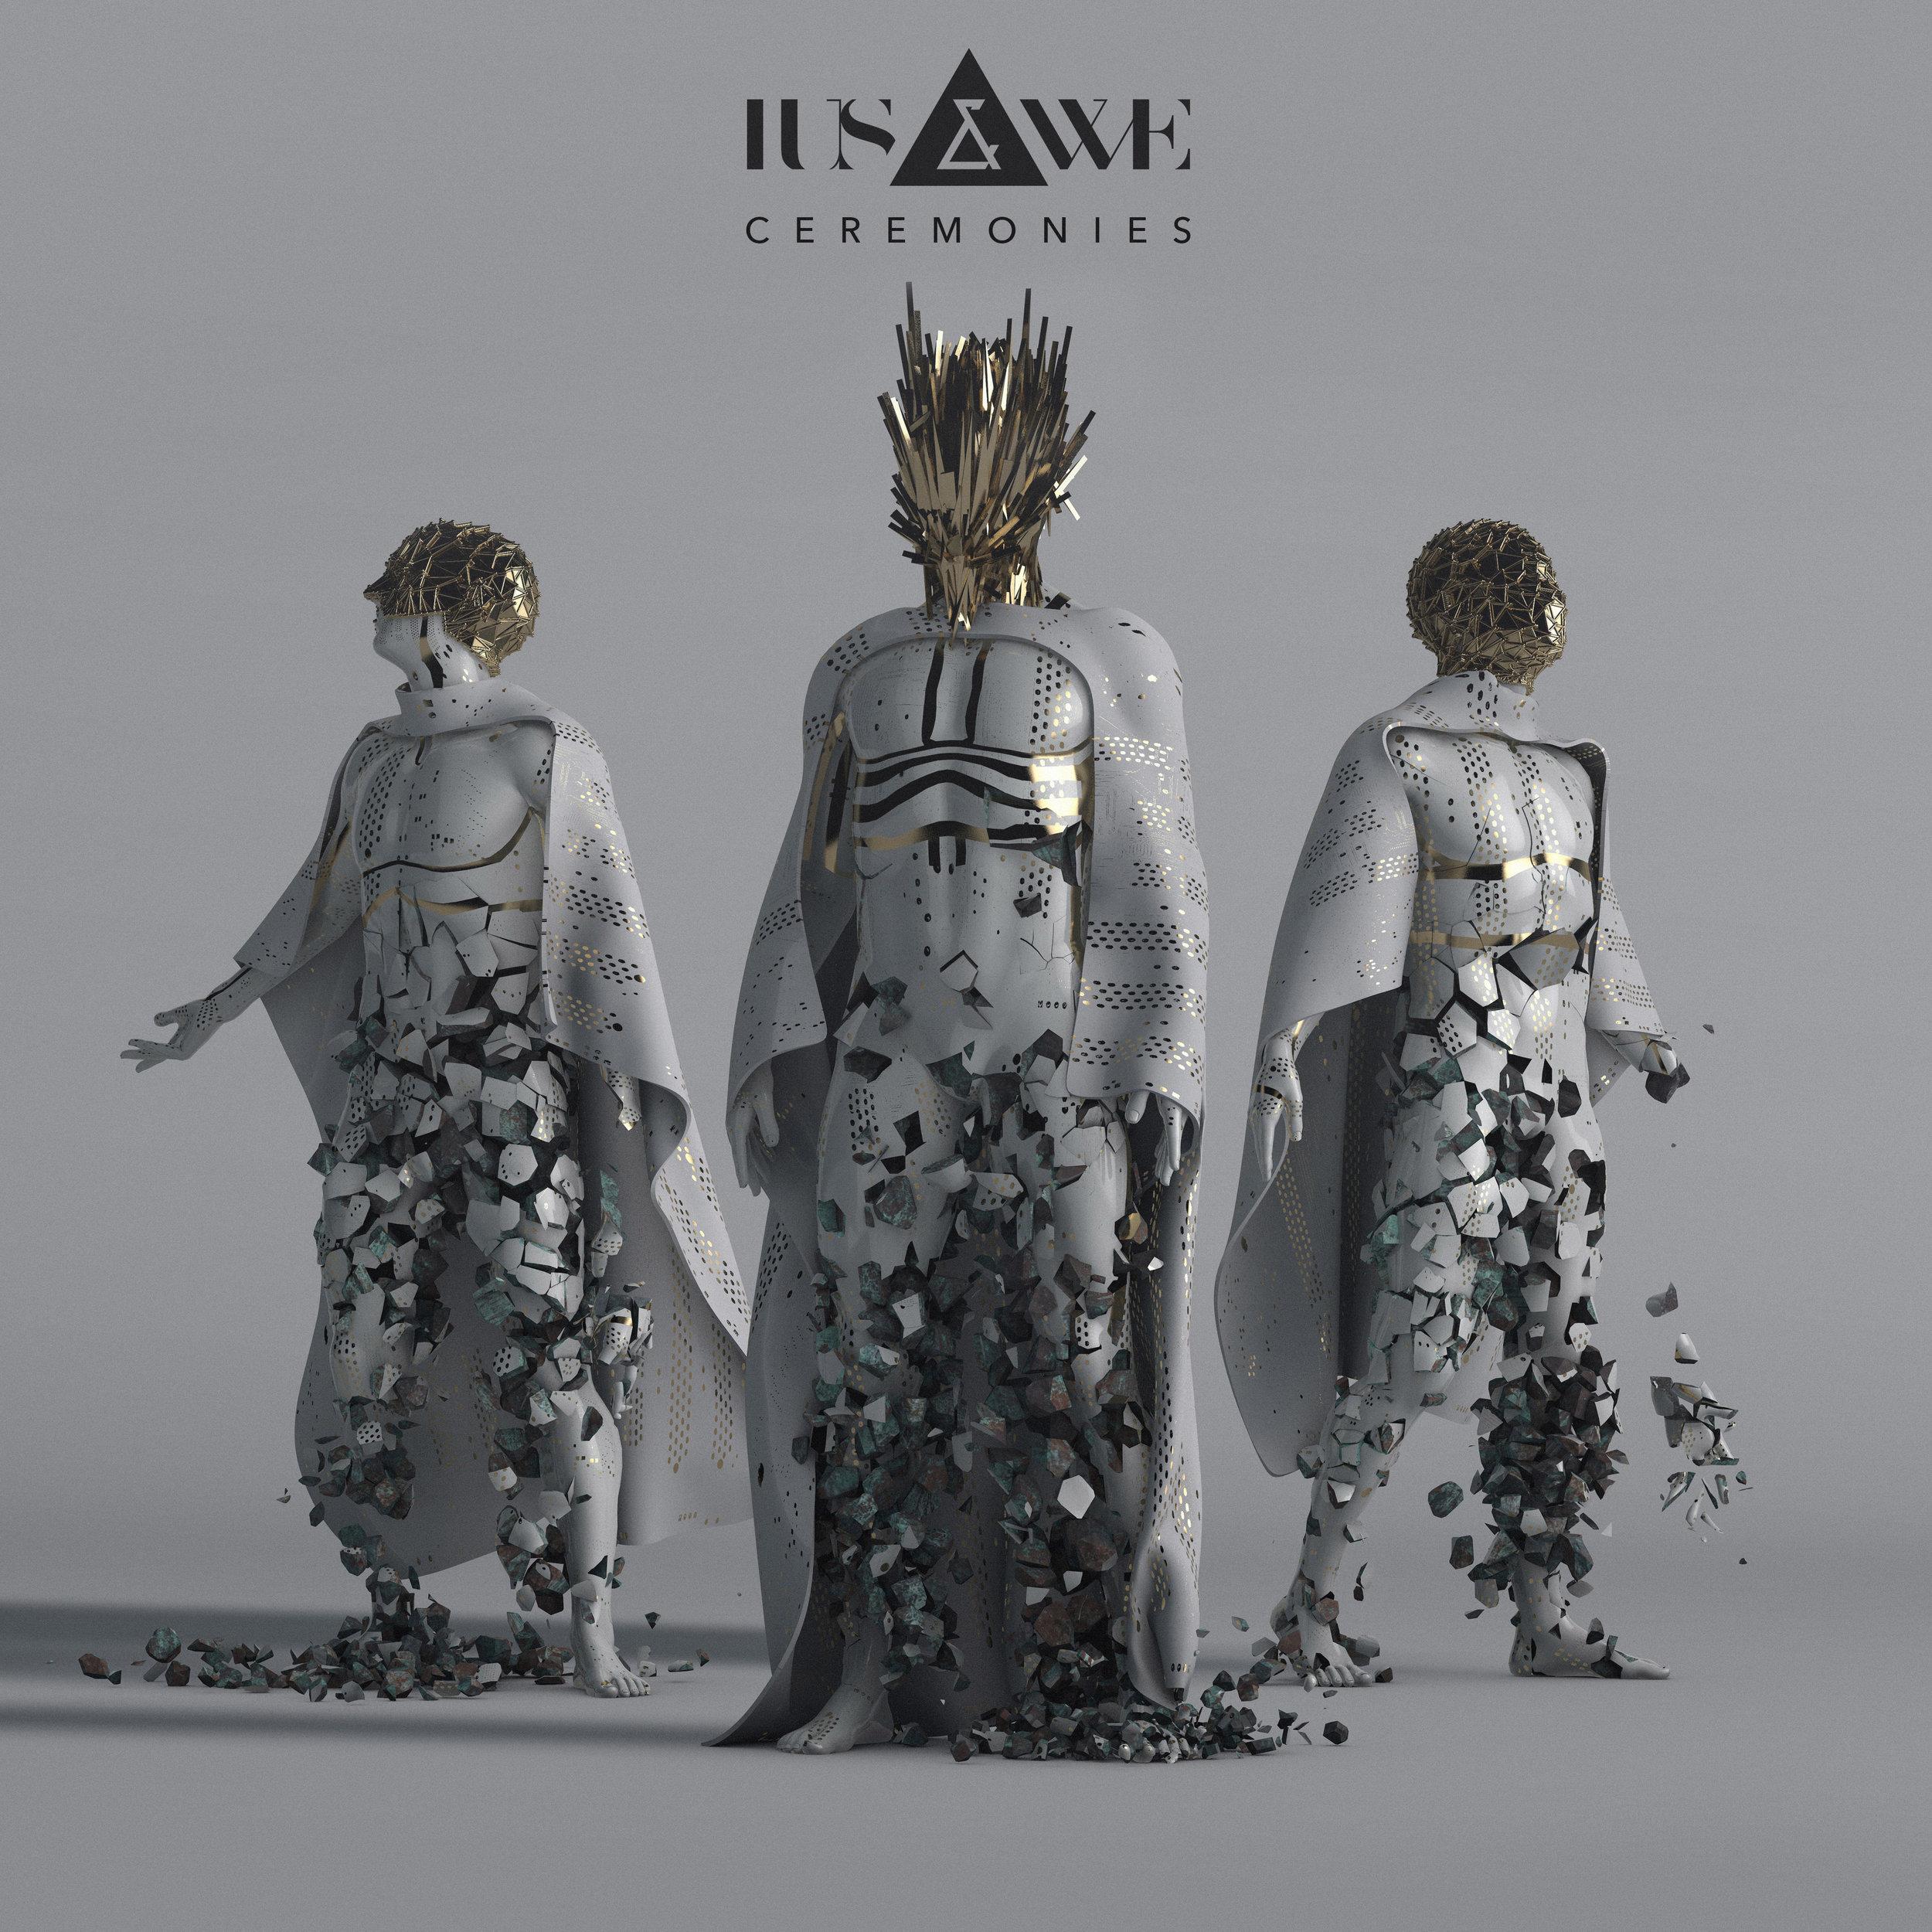 IUSWE-CeremoniesCoverFinal 1.jpg